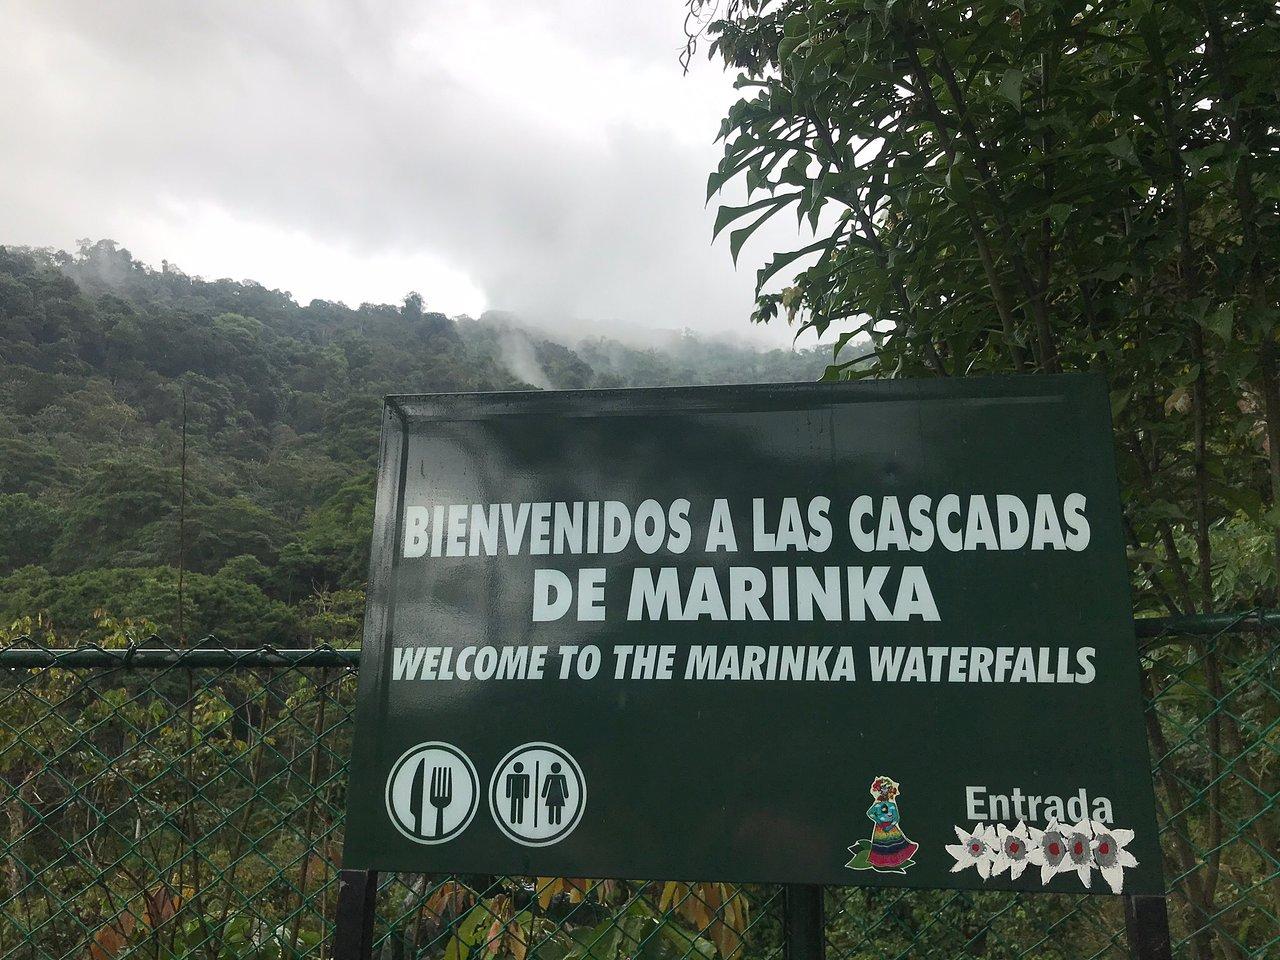 Cascada De Marinka Minca 2020 All You Need To Know Before You Go With Photos Tripadvisor